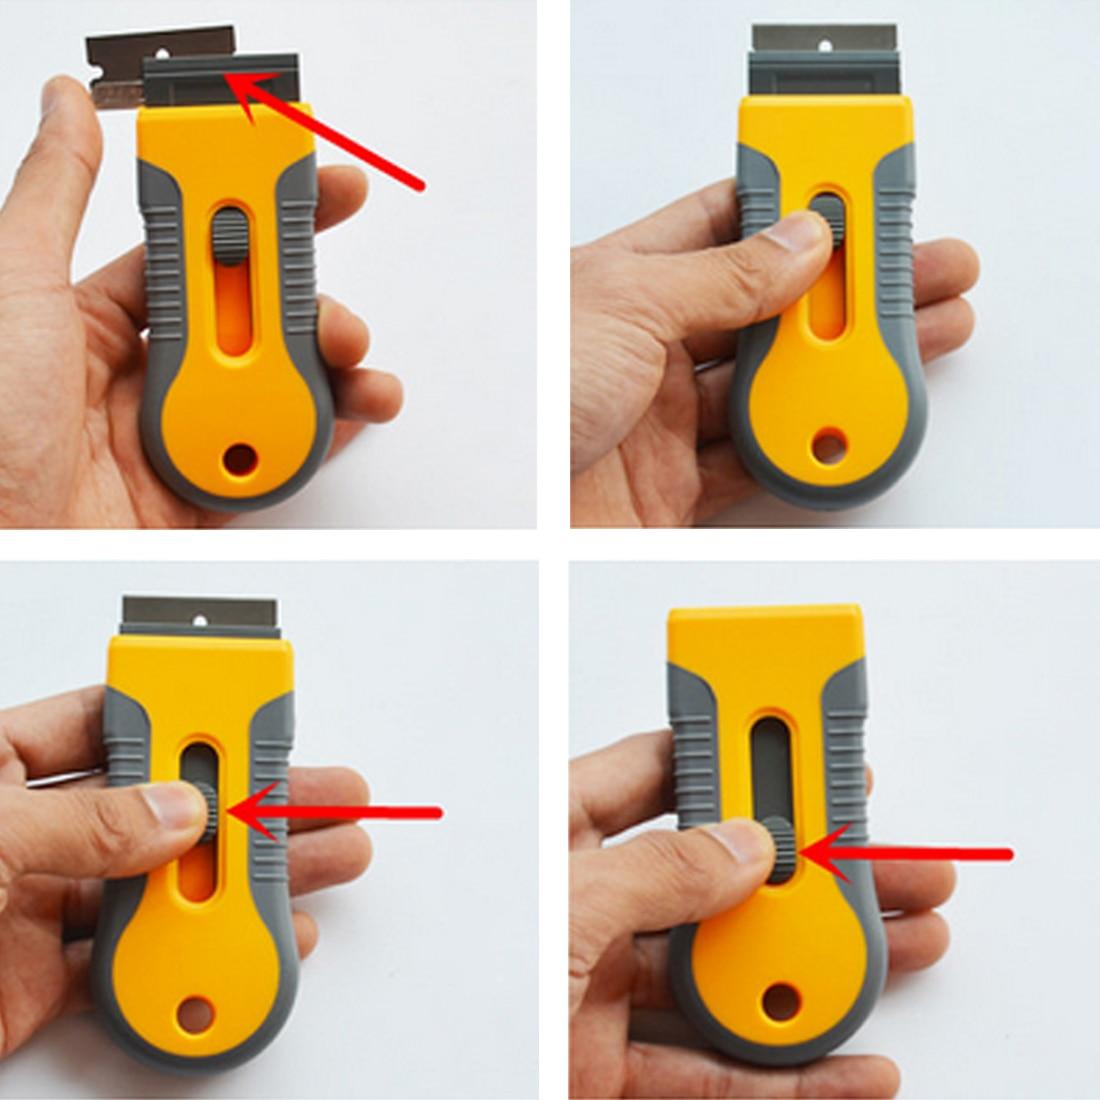 BU-Bauty Razor Scraper Steel Blades Knife Tinting Tools Ice Scraper Auto Car Sticker Squeegee Window Vinyl Film Remover